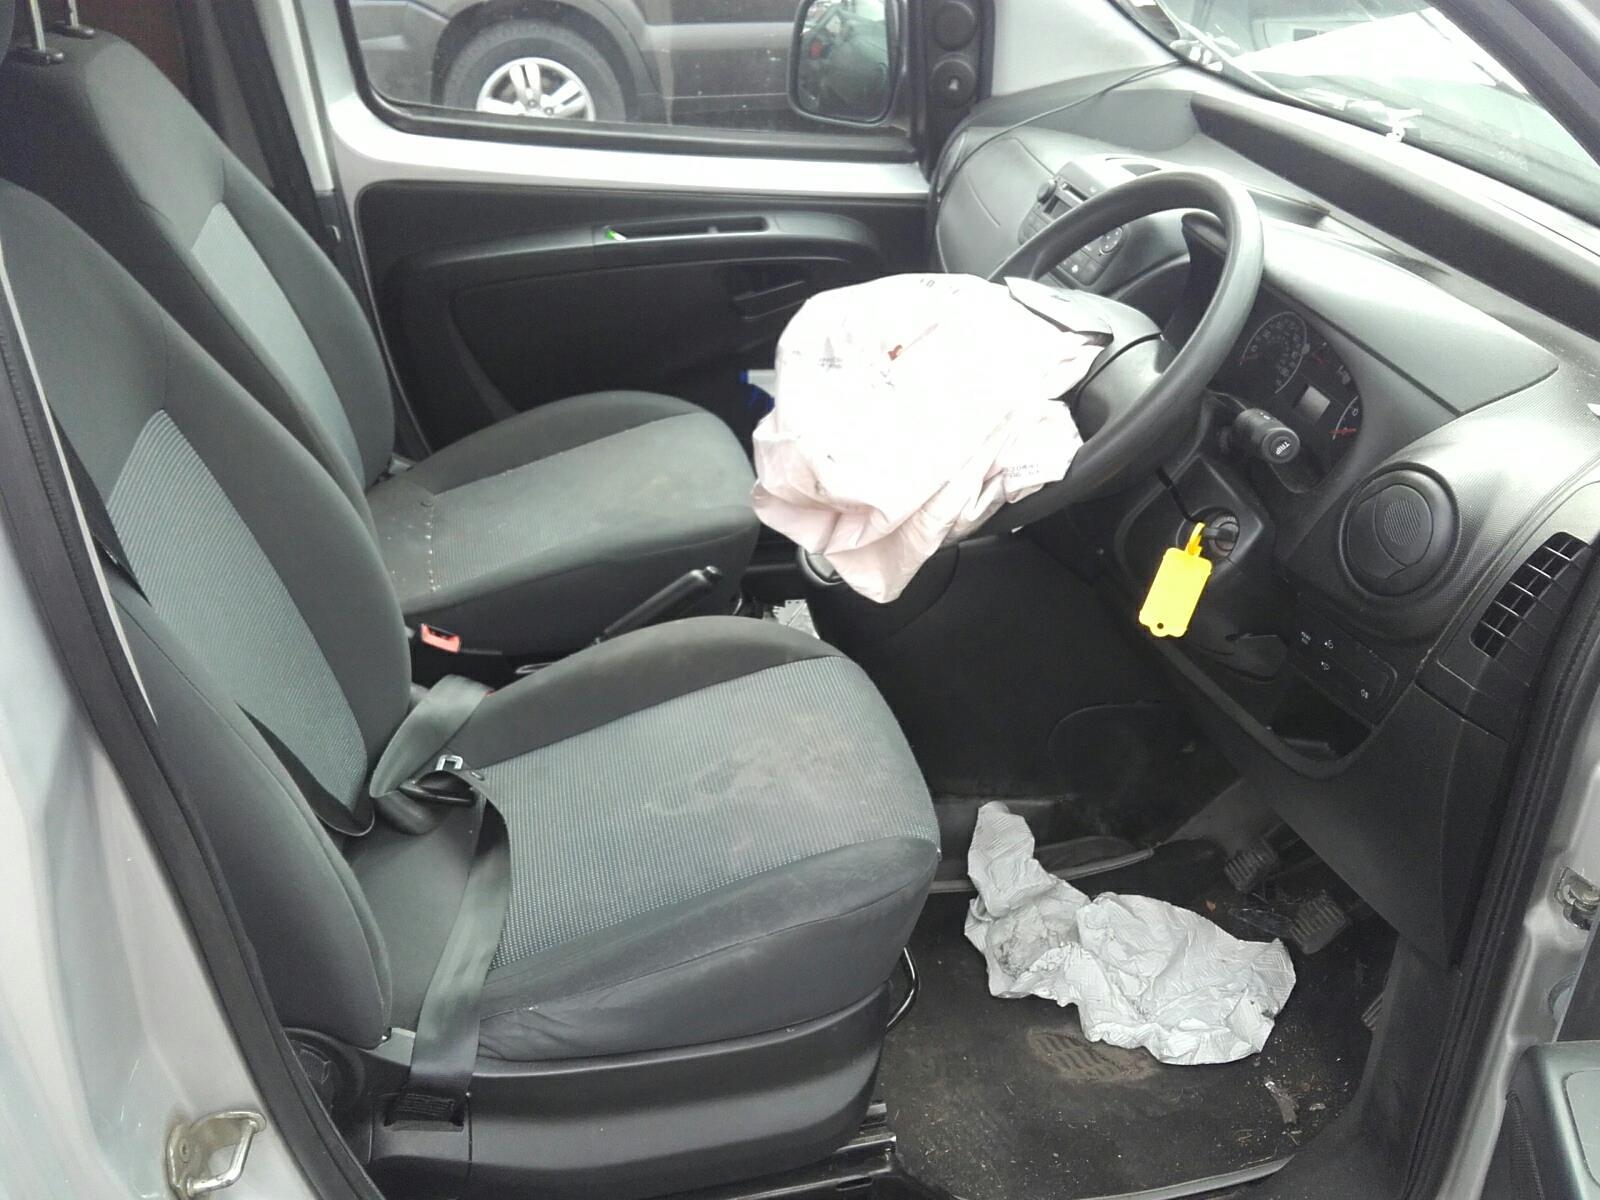 2014 Peugeot Bipper 2008 On Van Diesel Manual Breaking For Used Nissan Micra Fuse Box Location